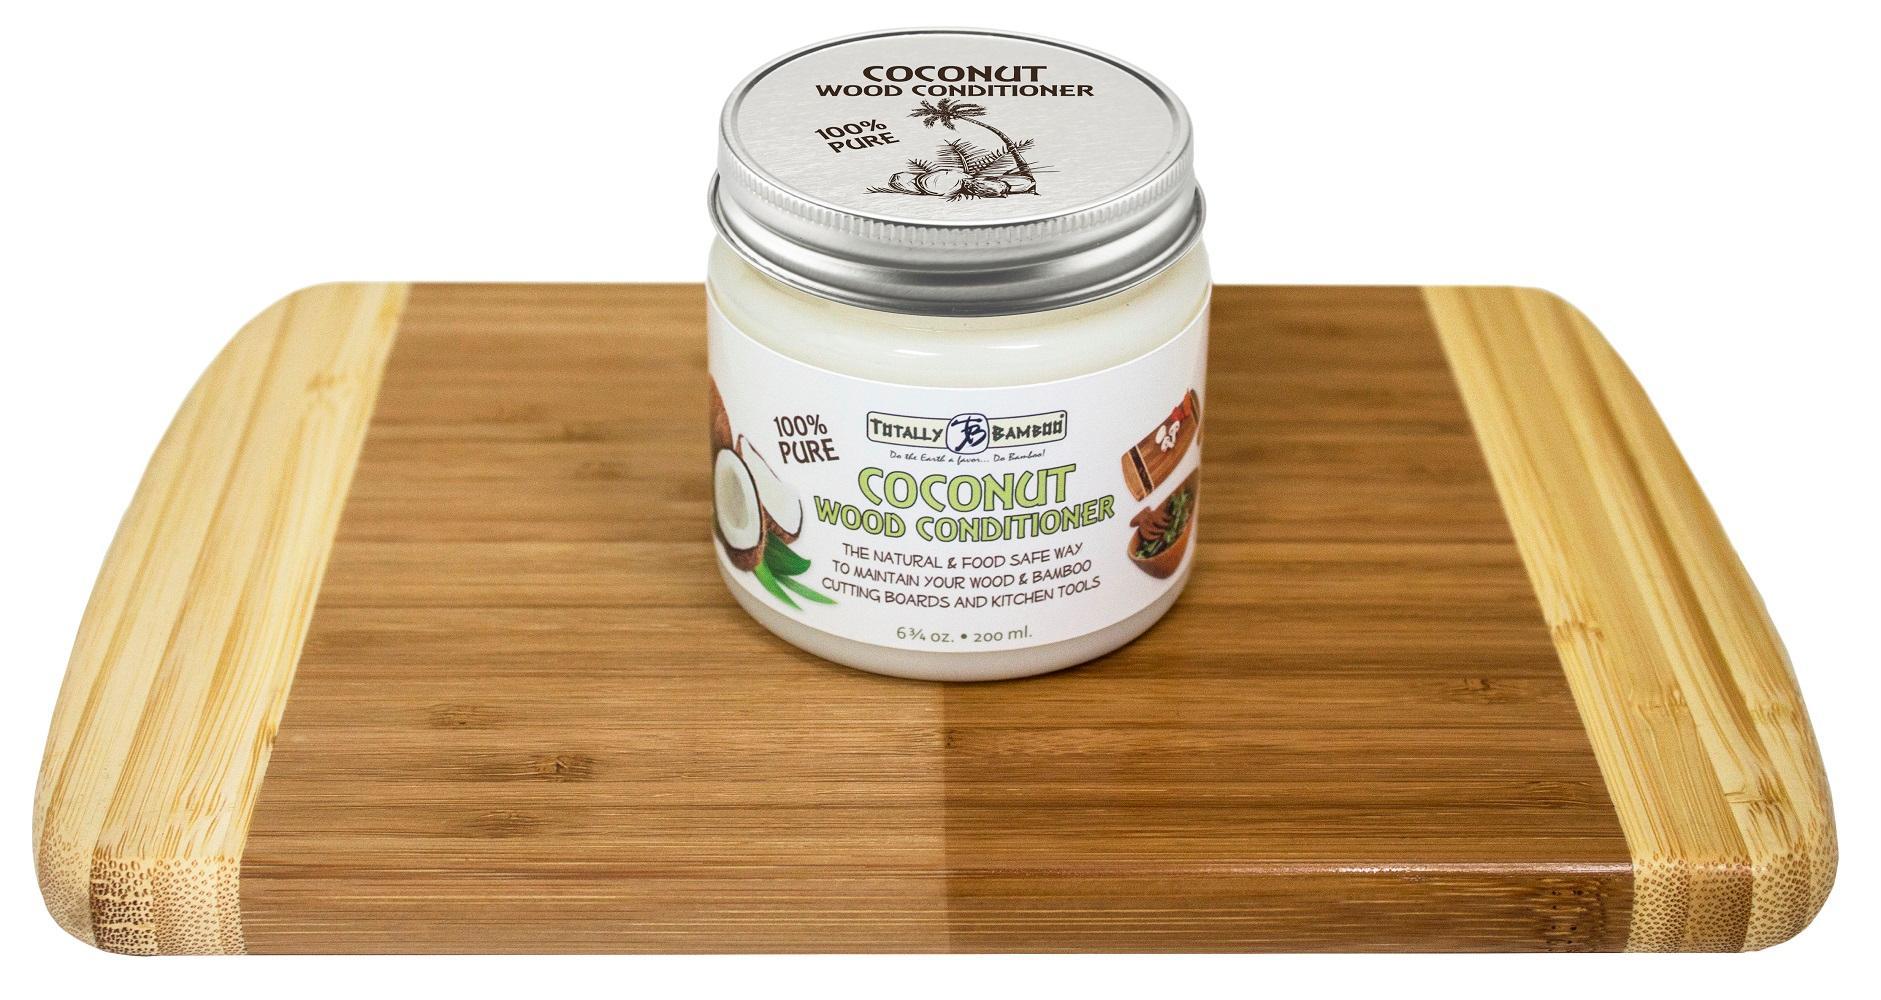 Totally bamboo 3 bowl butcher block prep board 16 5 x 22 cutting boards kitchen - Cutting board with prep bowls ...